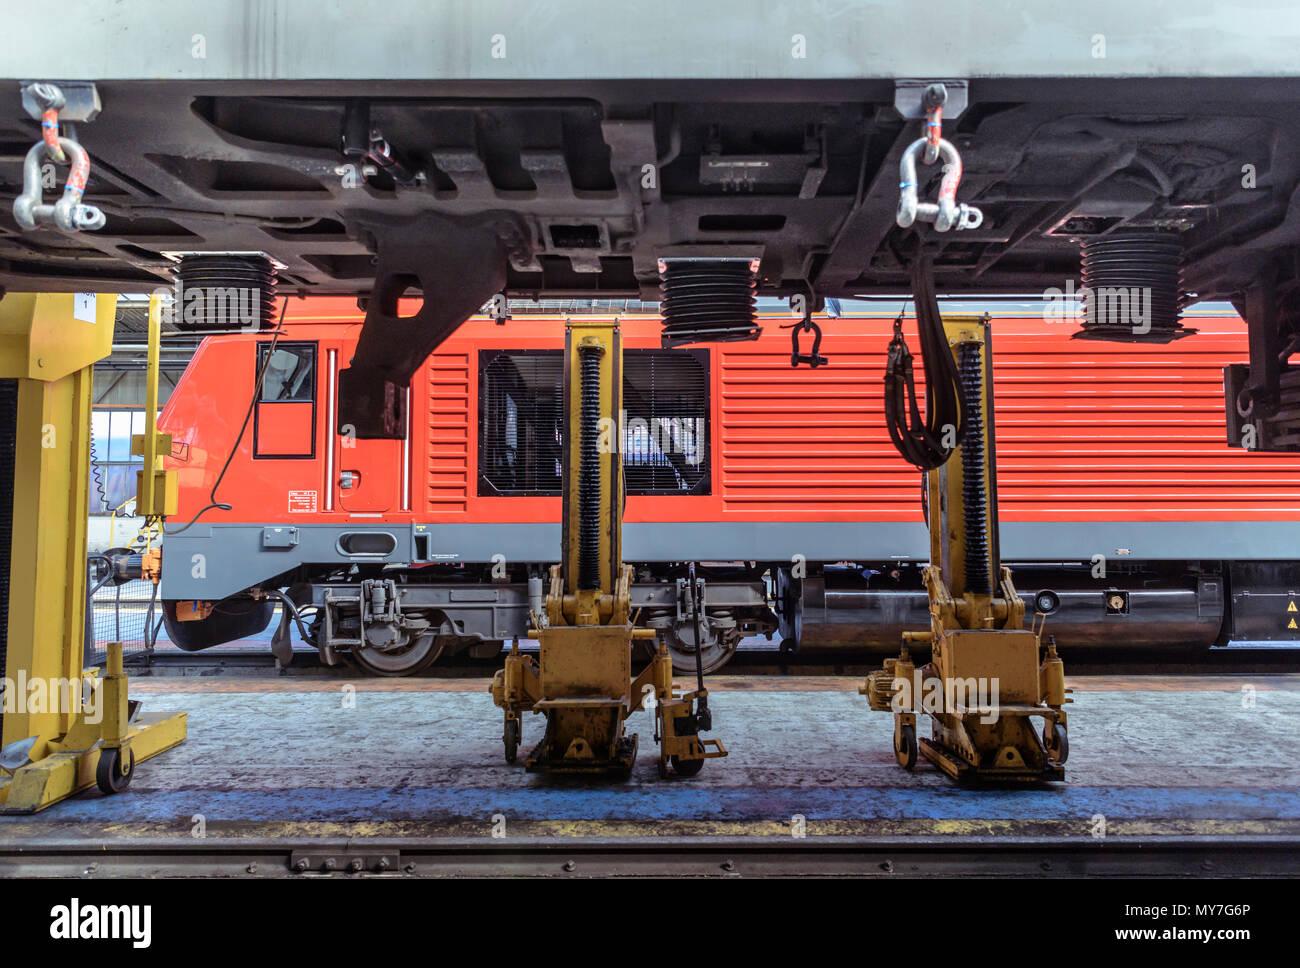 Refurbished locomotive in train engineering factory - Stock Image